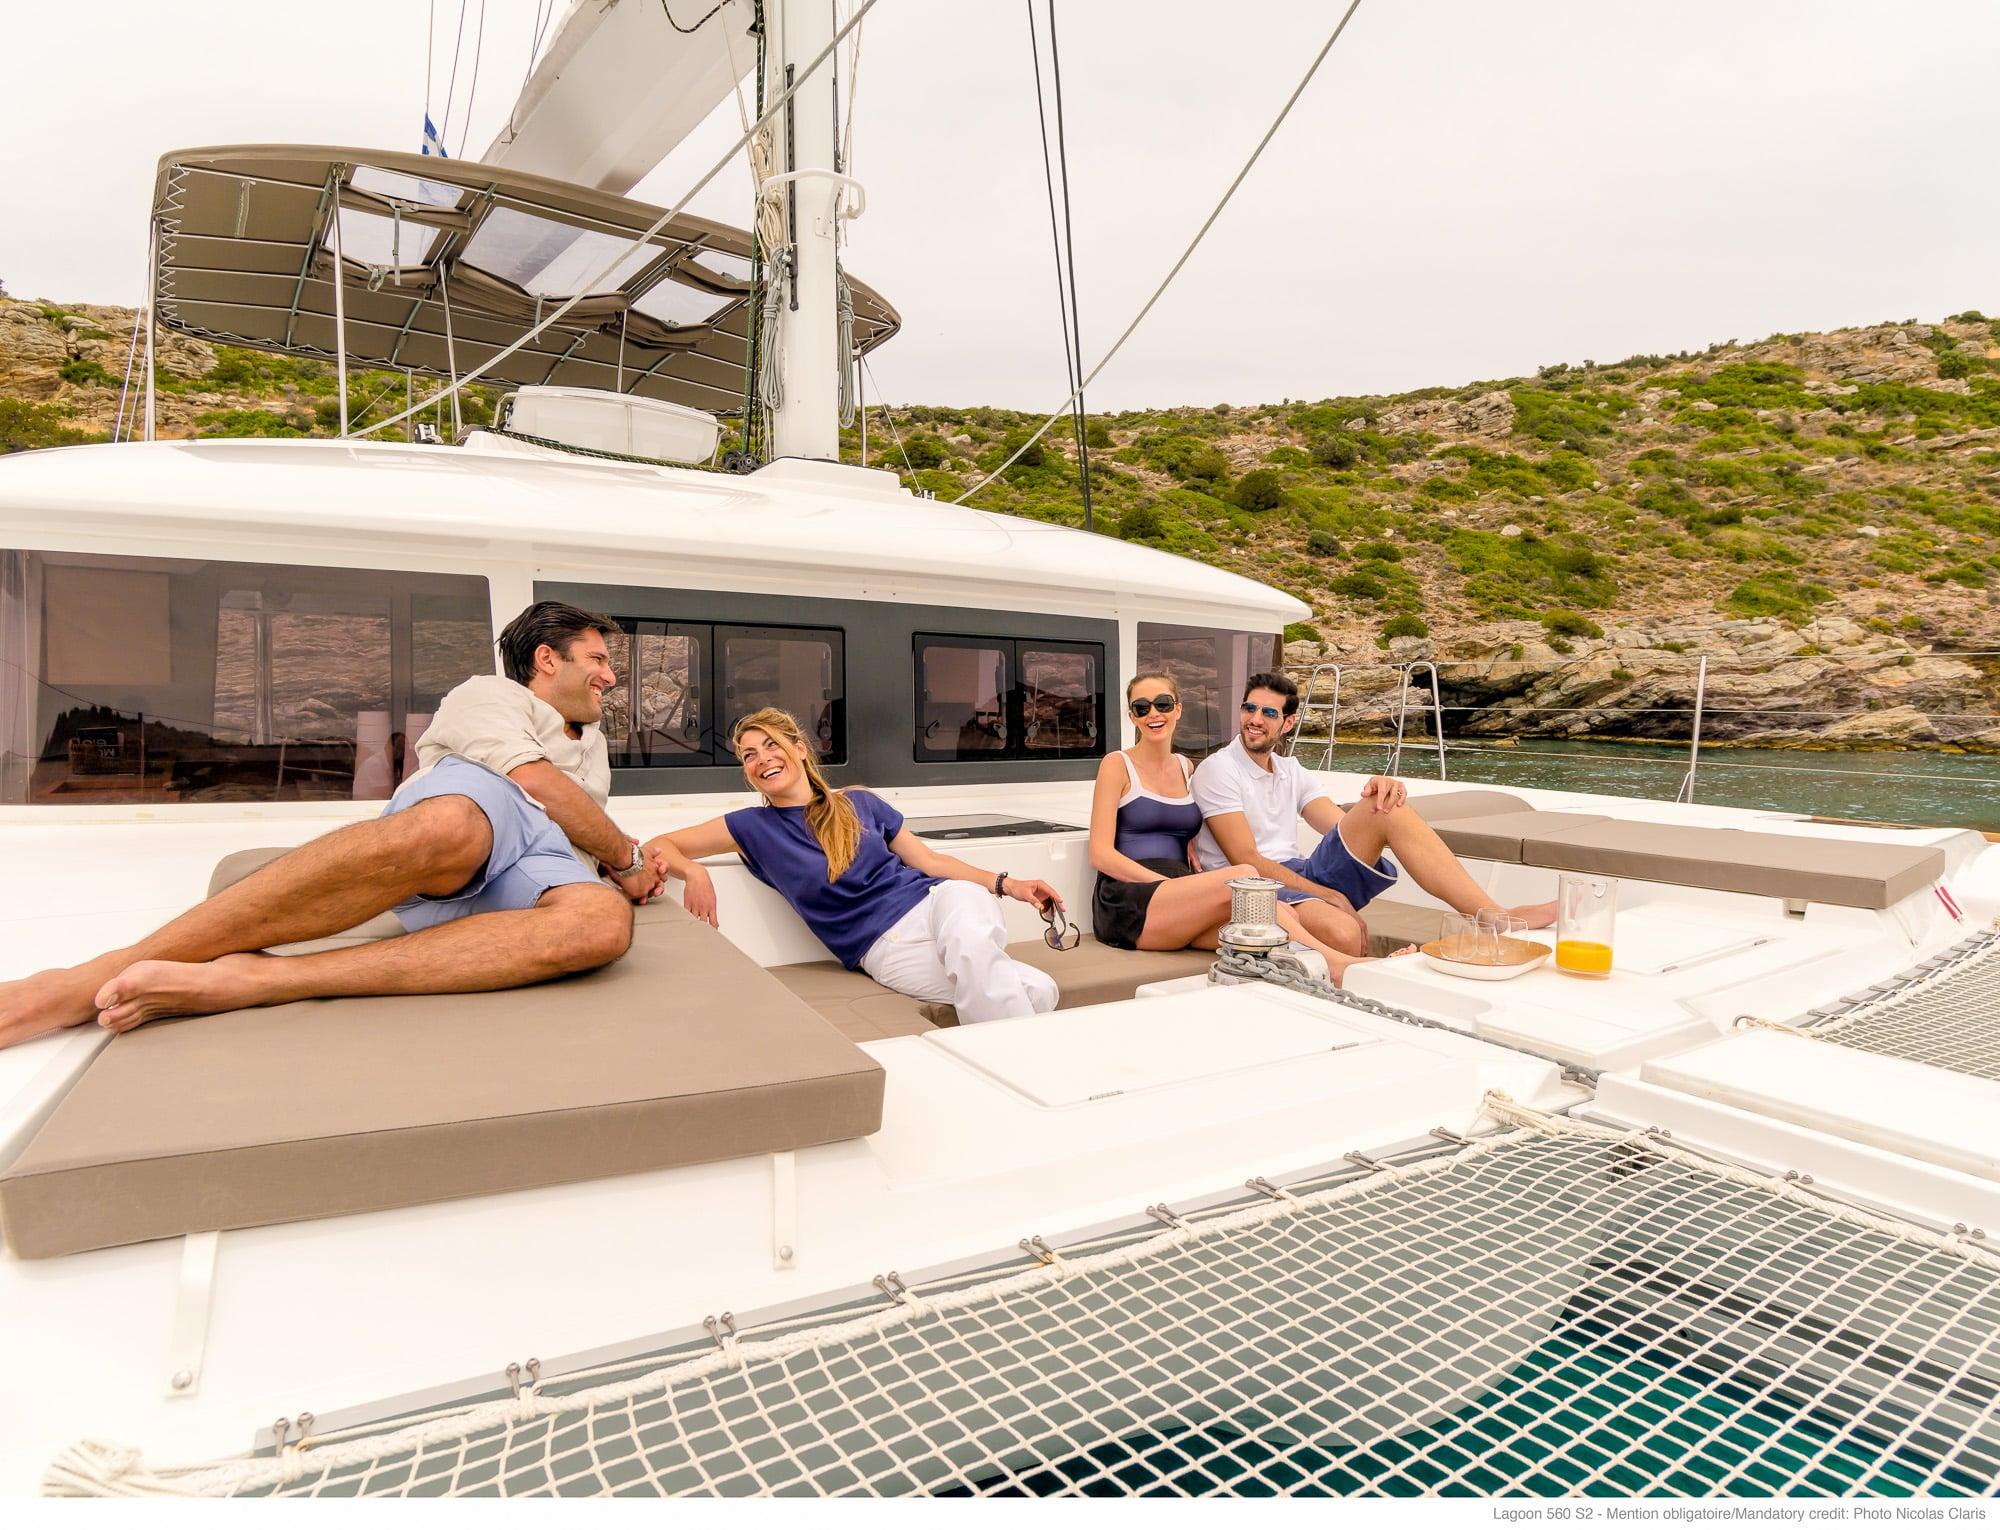 lagoon 560-yacht-charter-croatia-sailing-holidays-croatia-booking-yacht-charter-croatia-catamarans-sailboats-motorboats-gulets-luxury-yachts-boat-rental-croatia 8